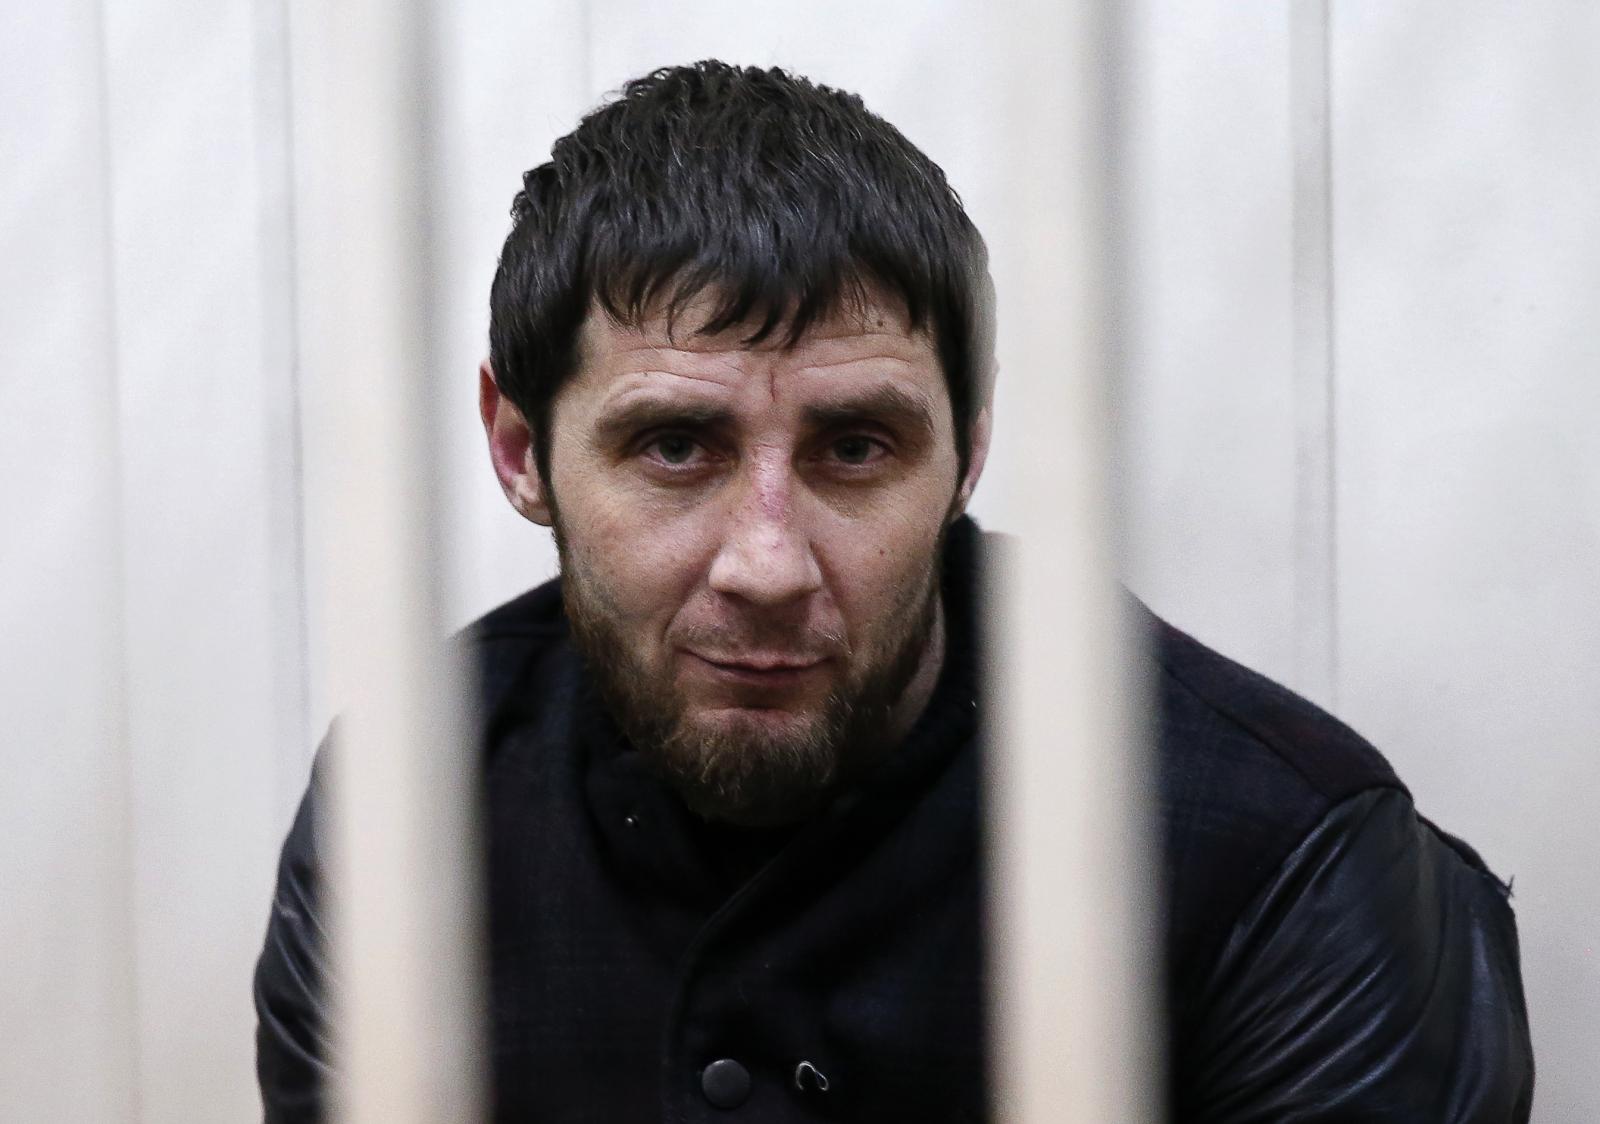 Zaur Dadayev, charged with involvement in themurderofBorisNemtsov